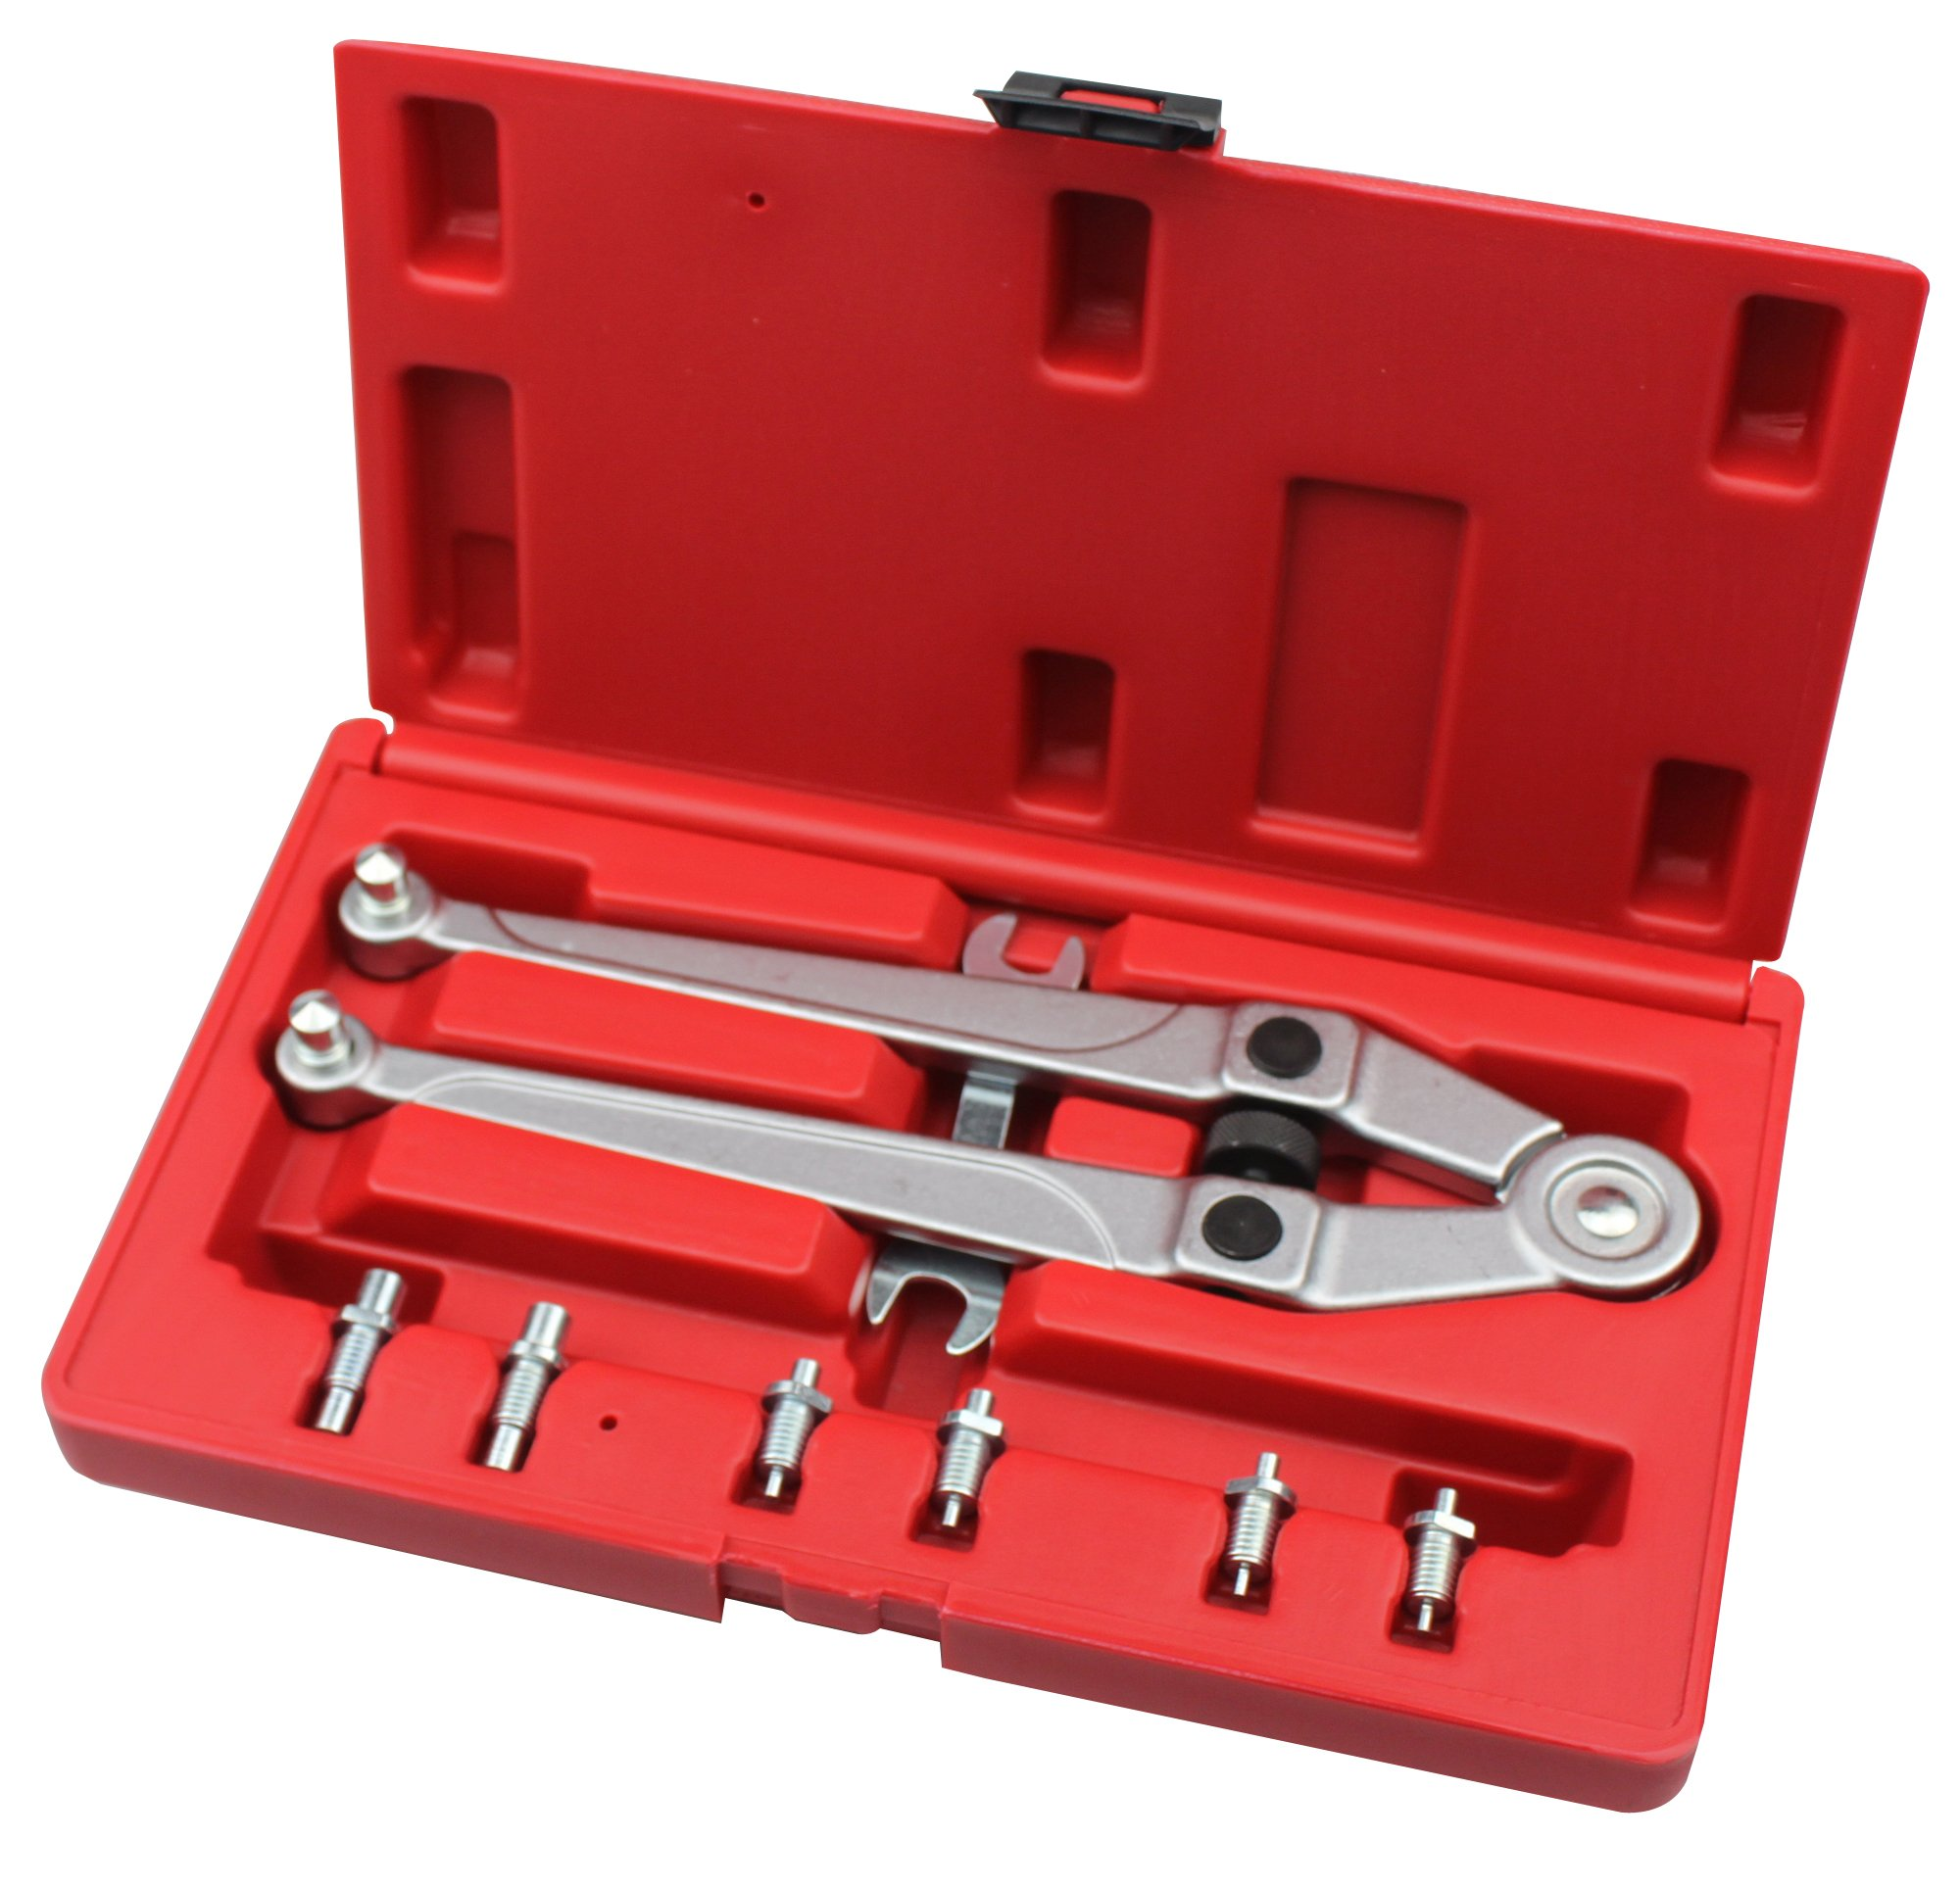 Auto part ET-00401 Universal PIN Spanner Set Gland NUT Wrench Range: 25/32'' - 3-15/16''